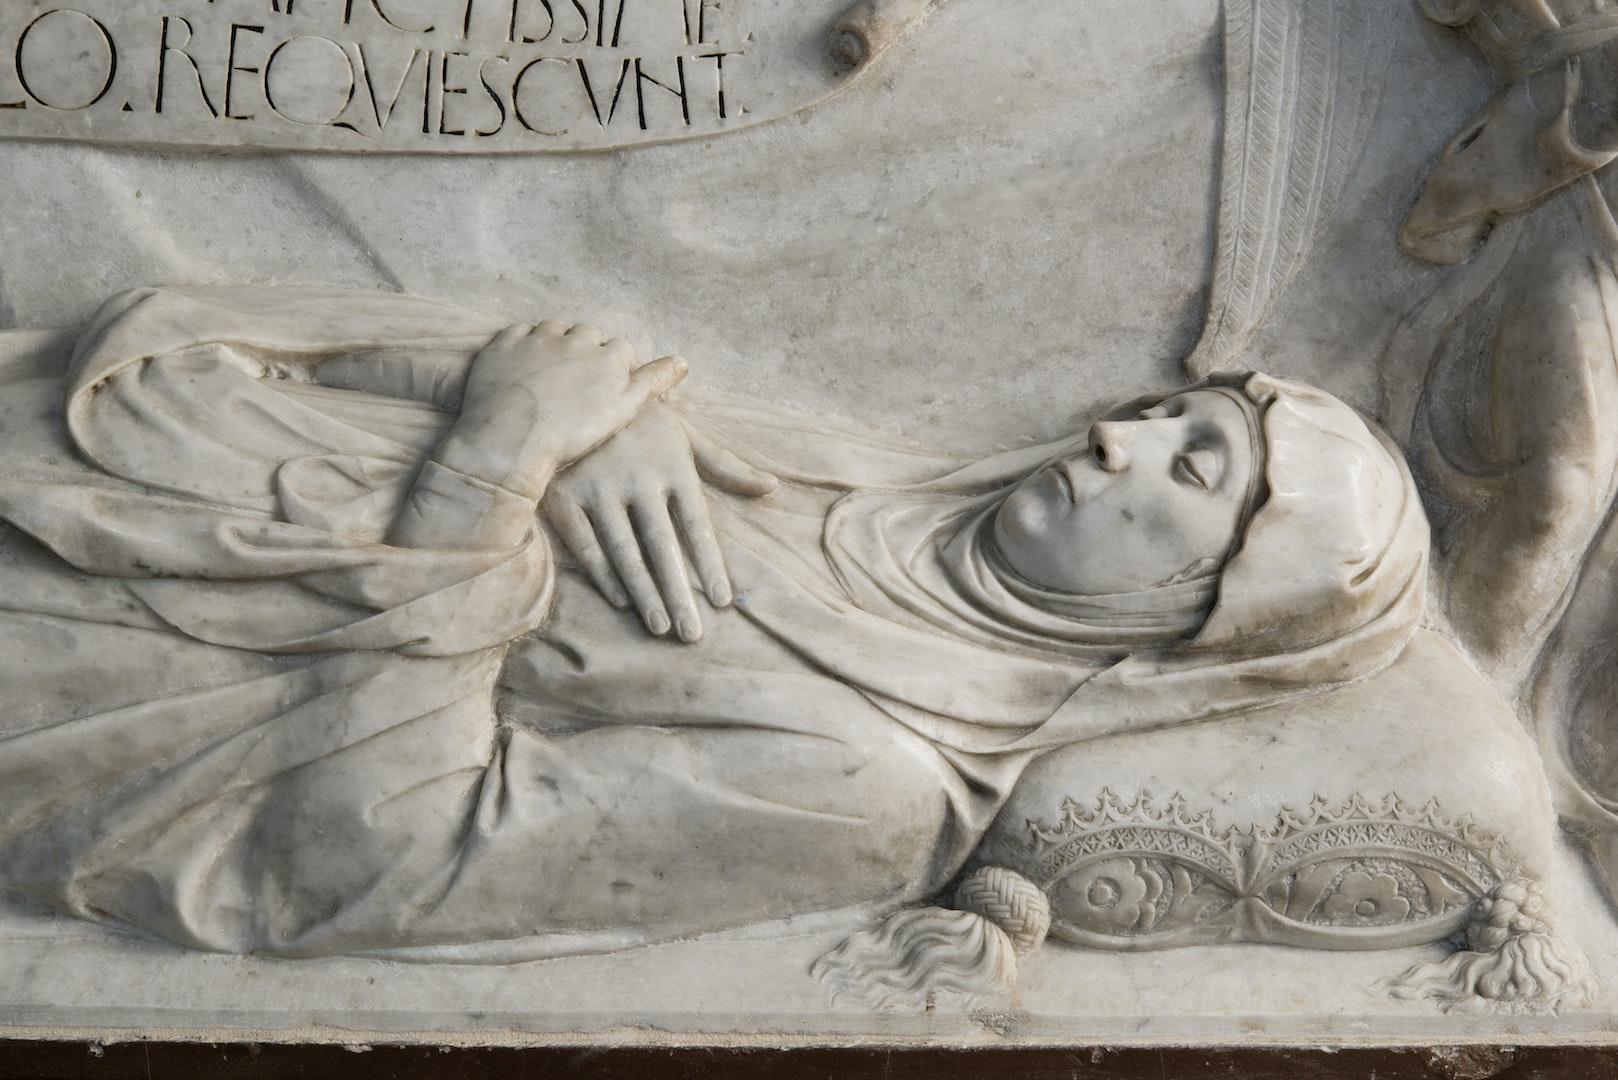 1516890614 smn navata antonio rossellino la beata villana aq05764 copia